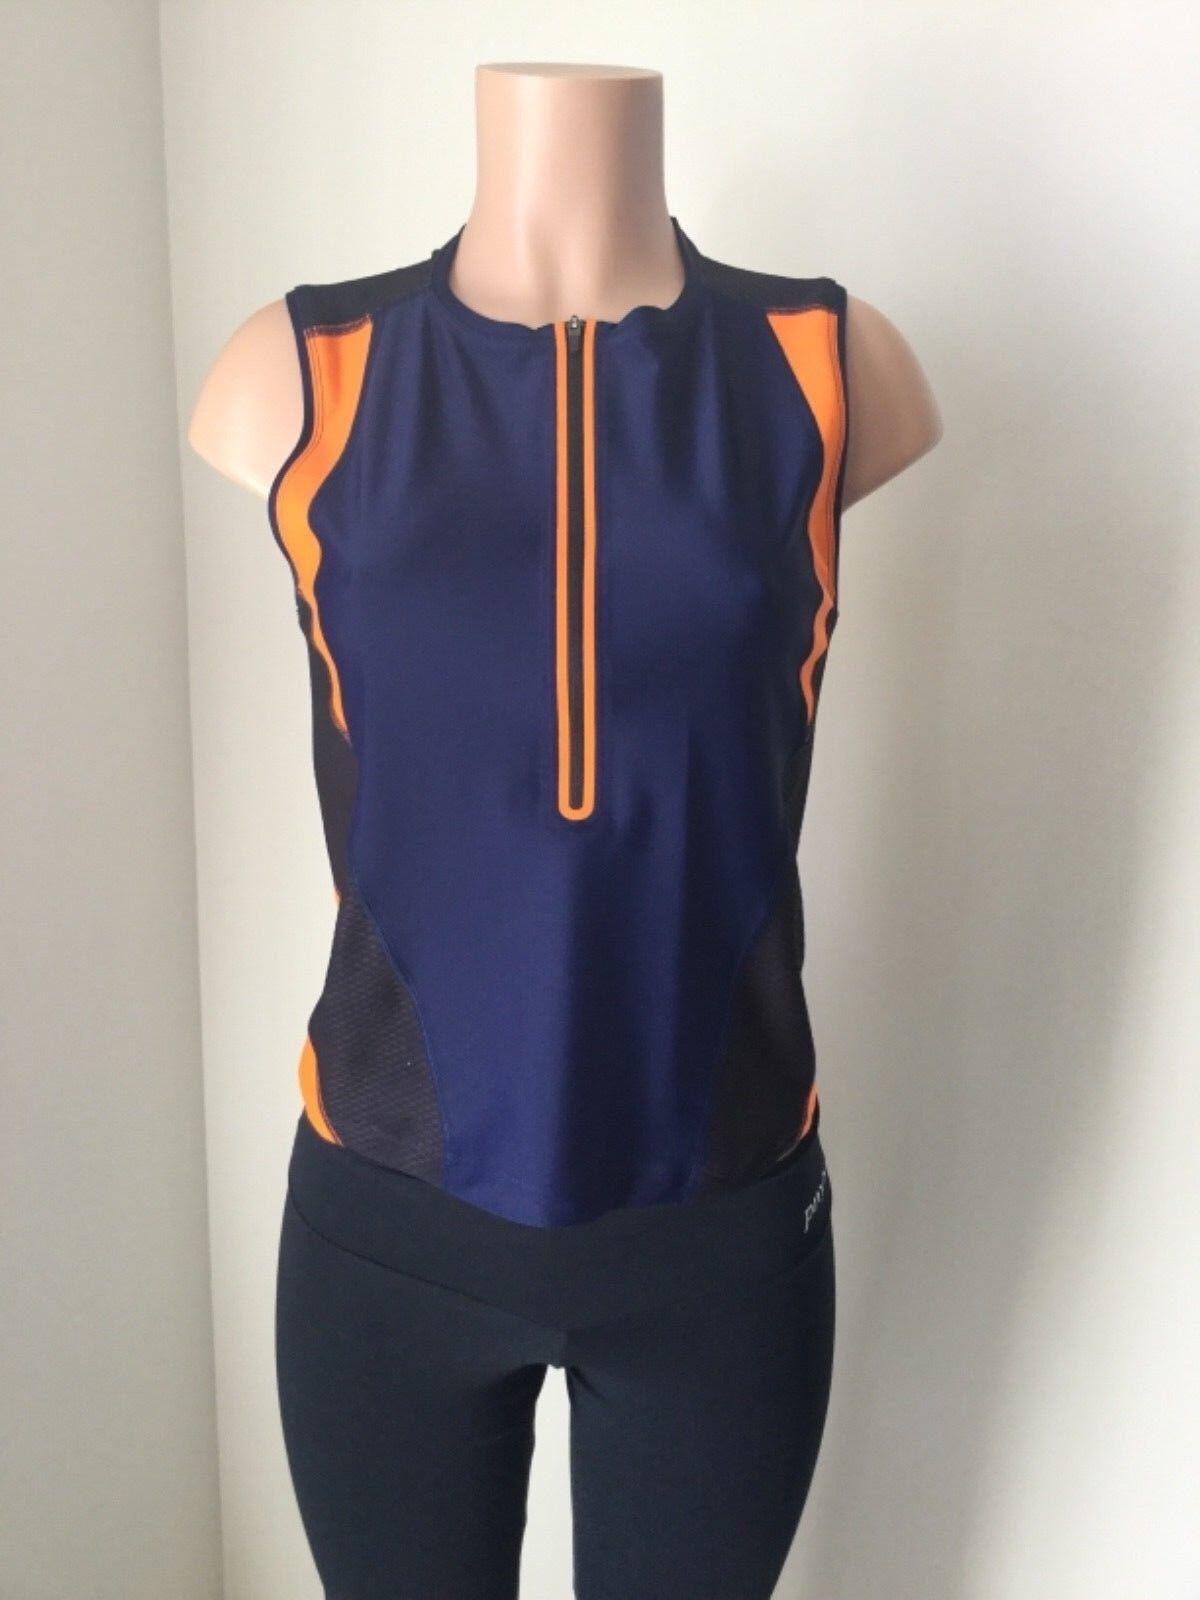 Laain Althea Curve Mesh Tops shirt L  activewear  Women's bluee zippered